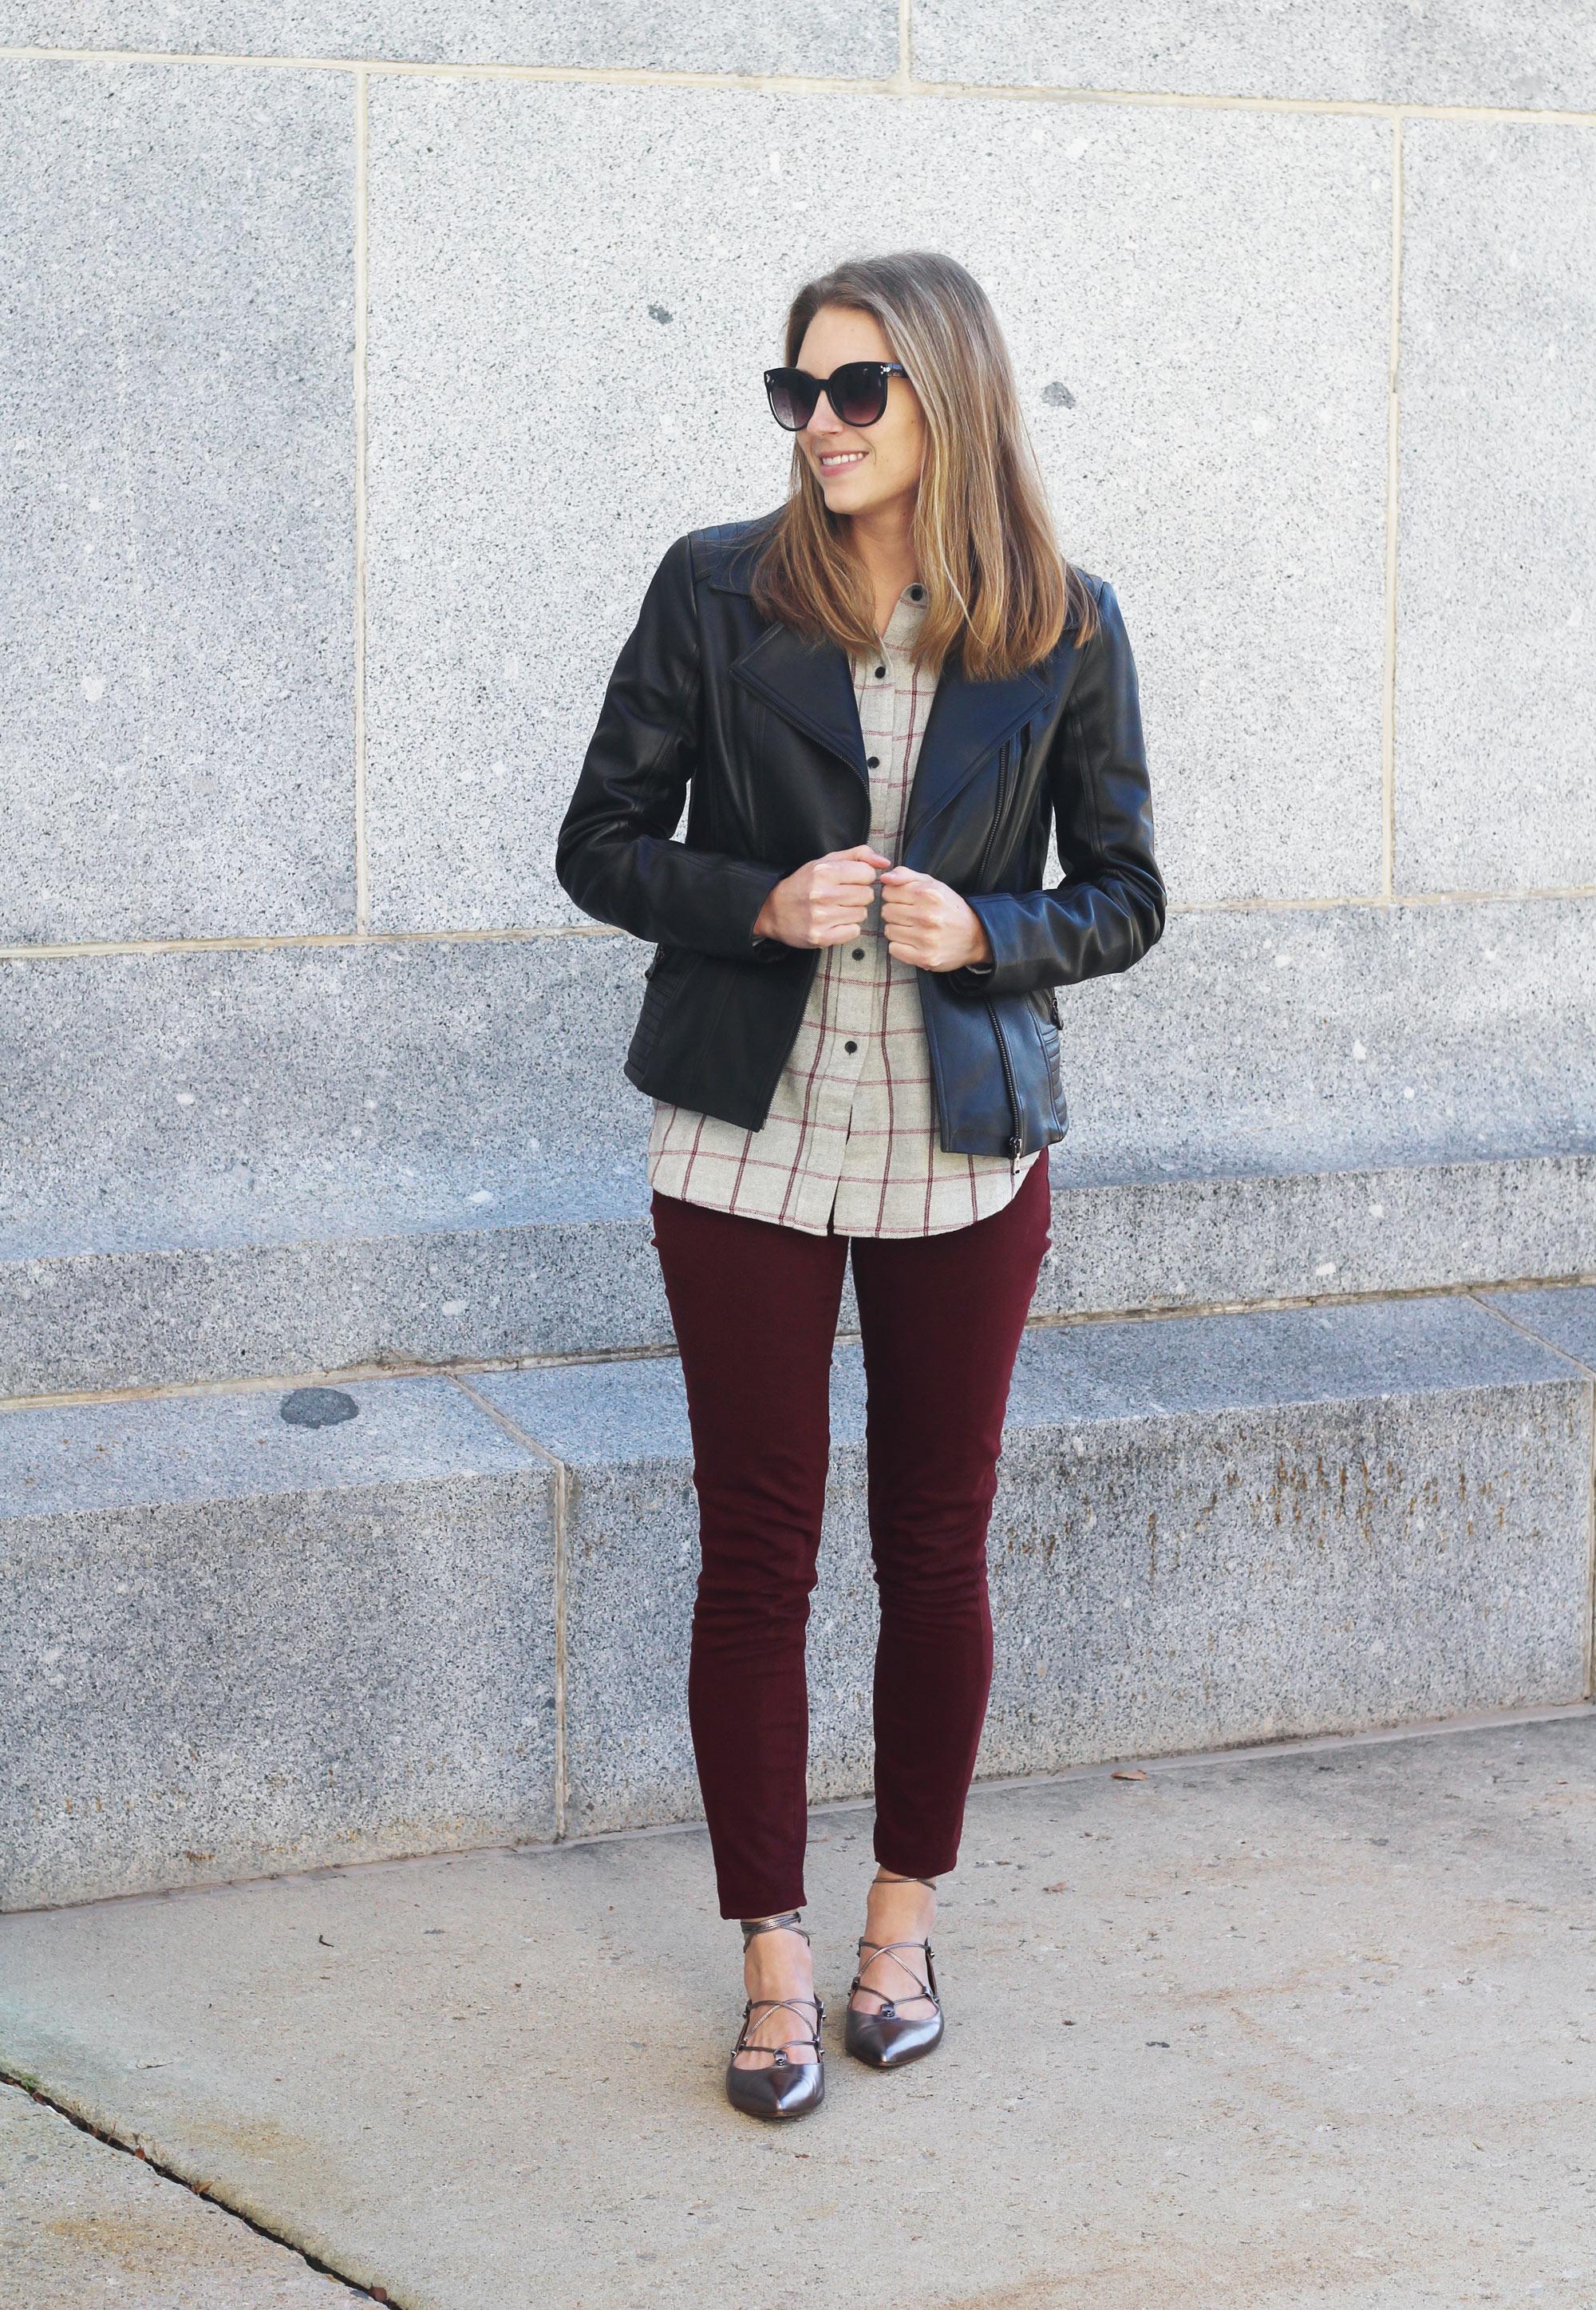 Leather (jacket) weather